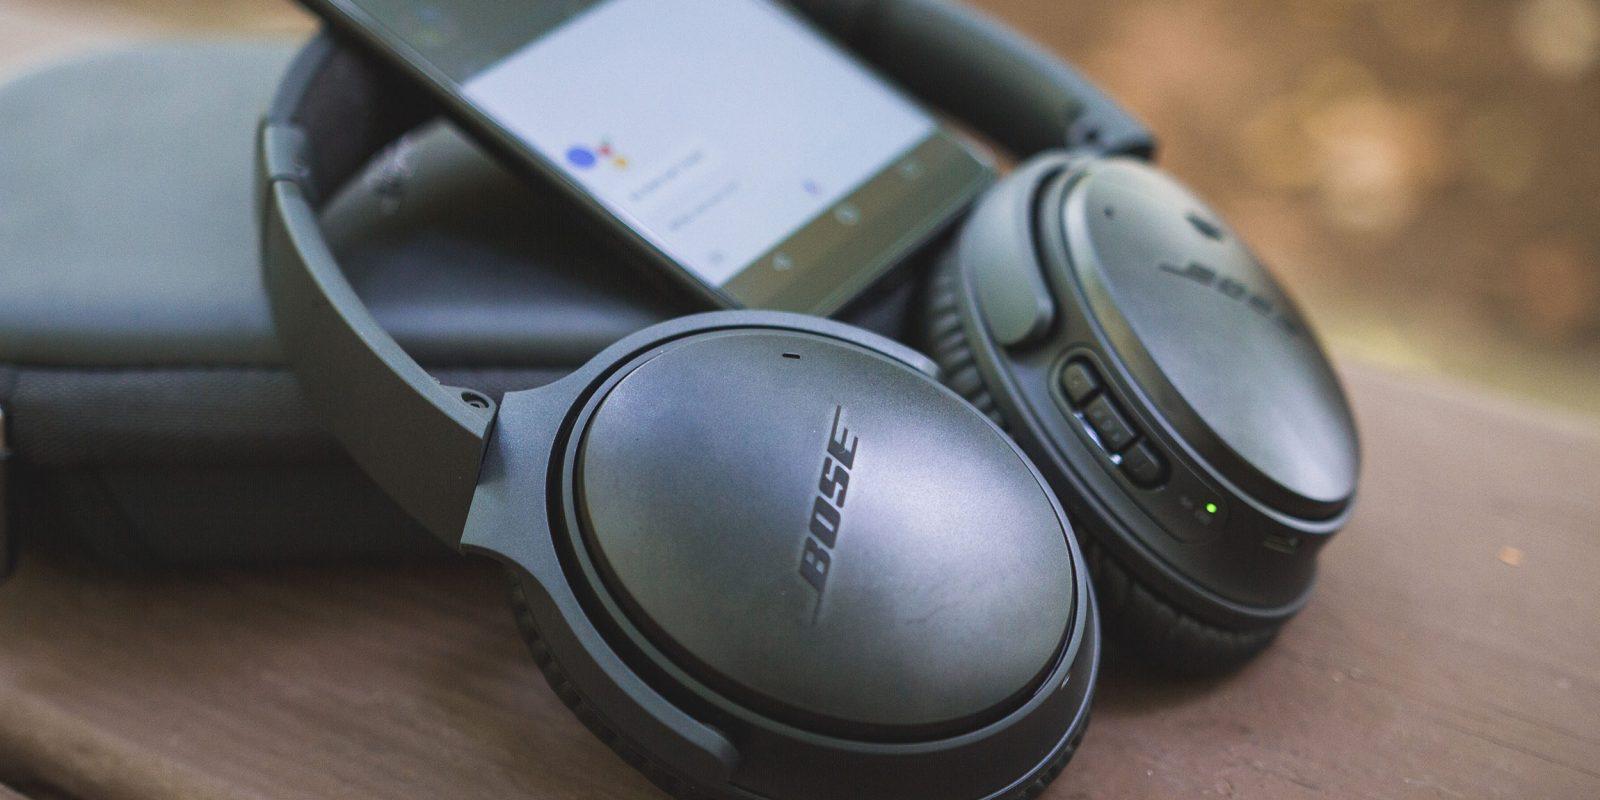 Google Assistant Headphones - 9to5Google